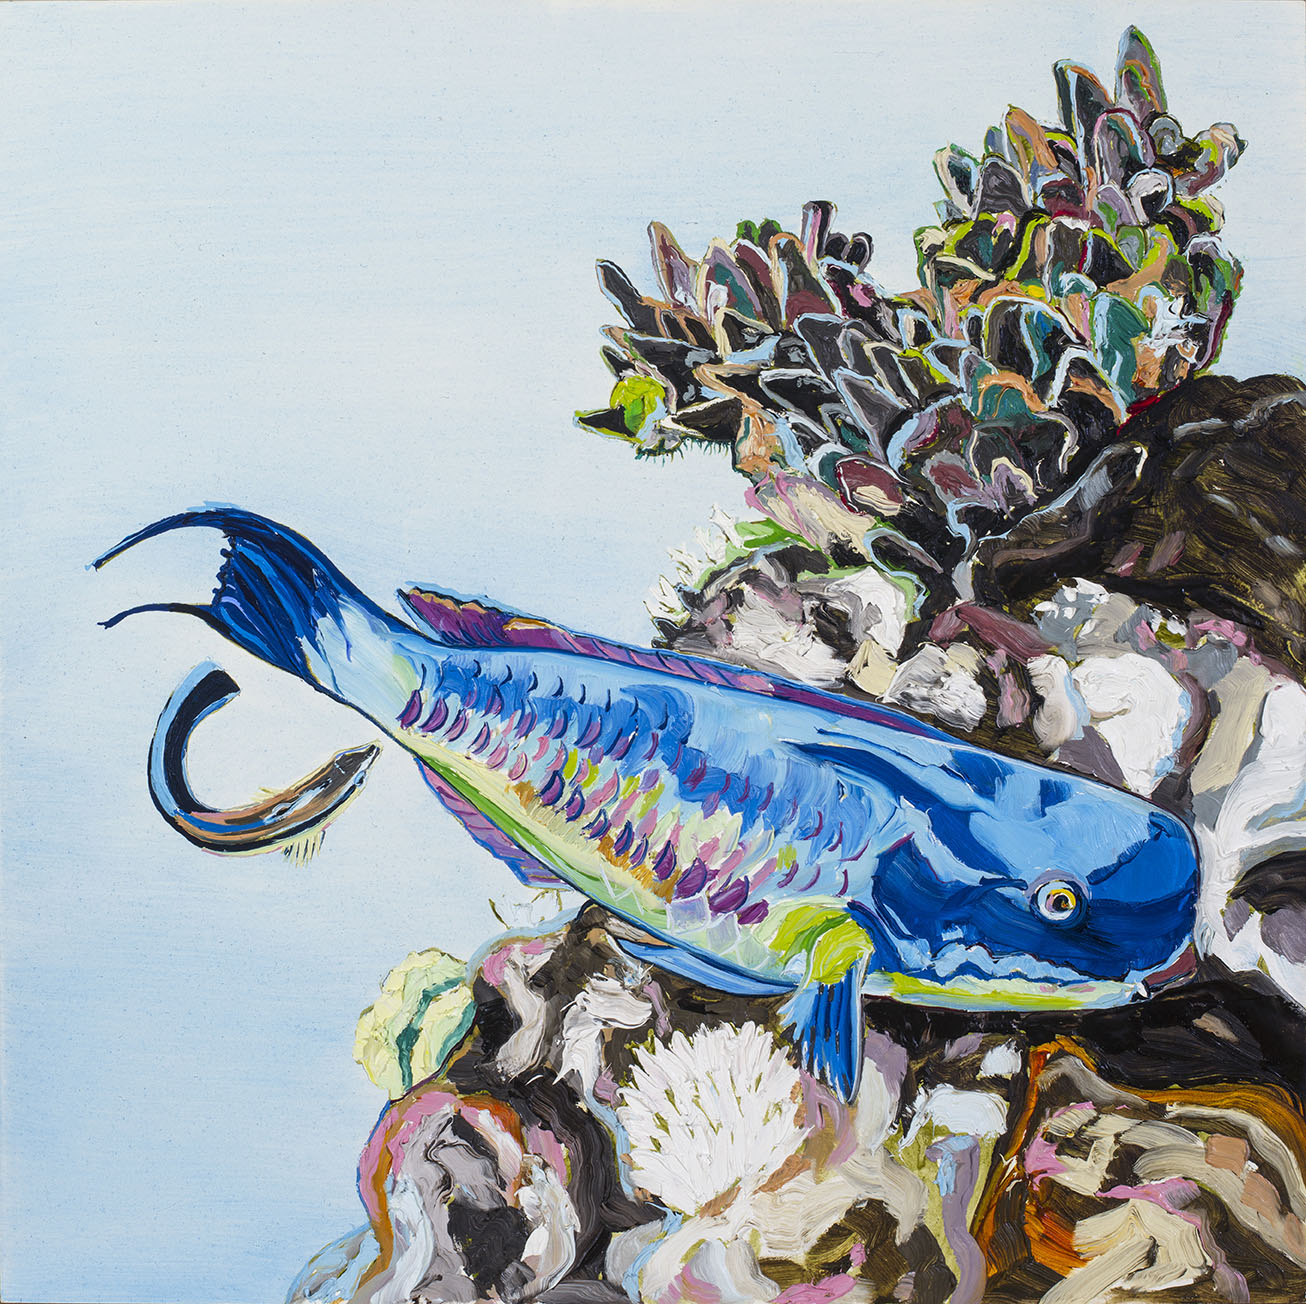 E Lindsay 2017 Steephead parrotfish, cleaner wrasse & deadcoral